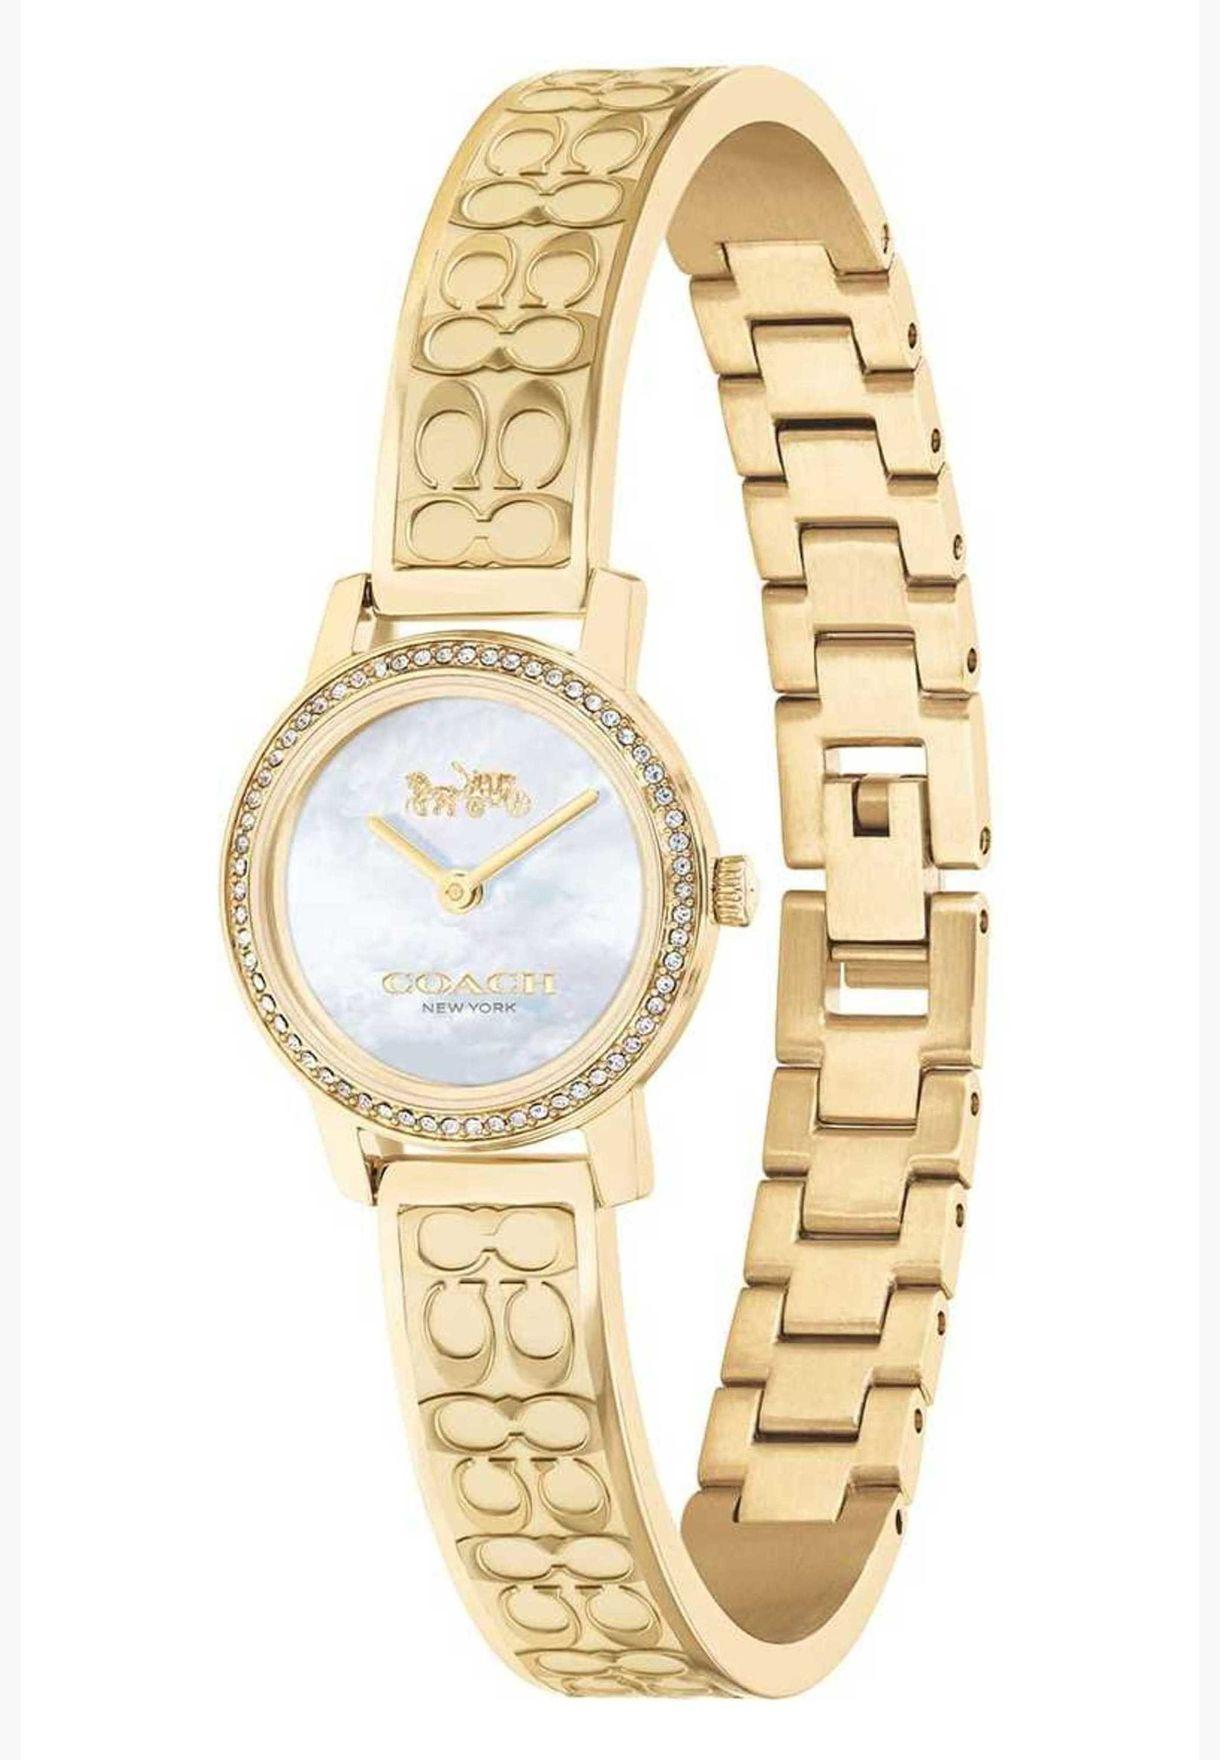 Coach Audrey Steel Strap Watch for Women - 14503497